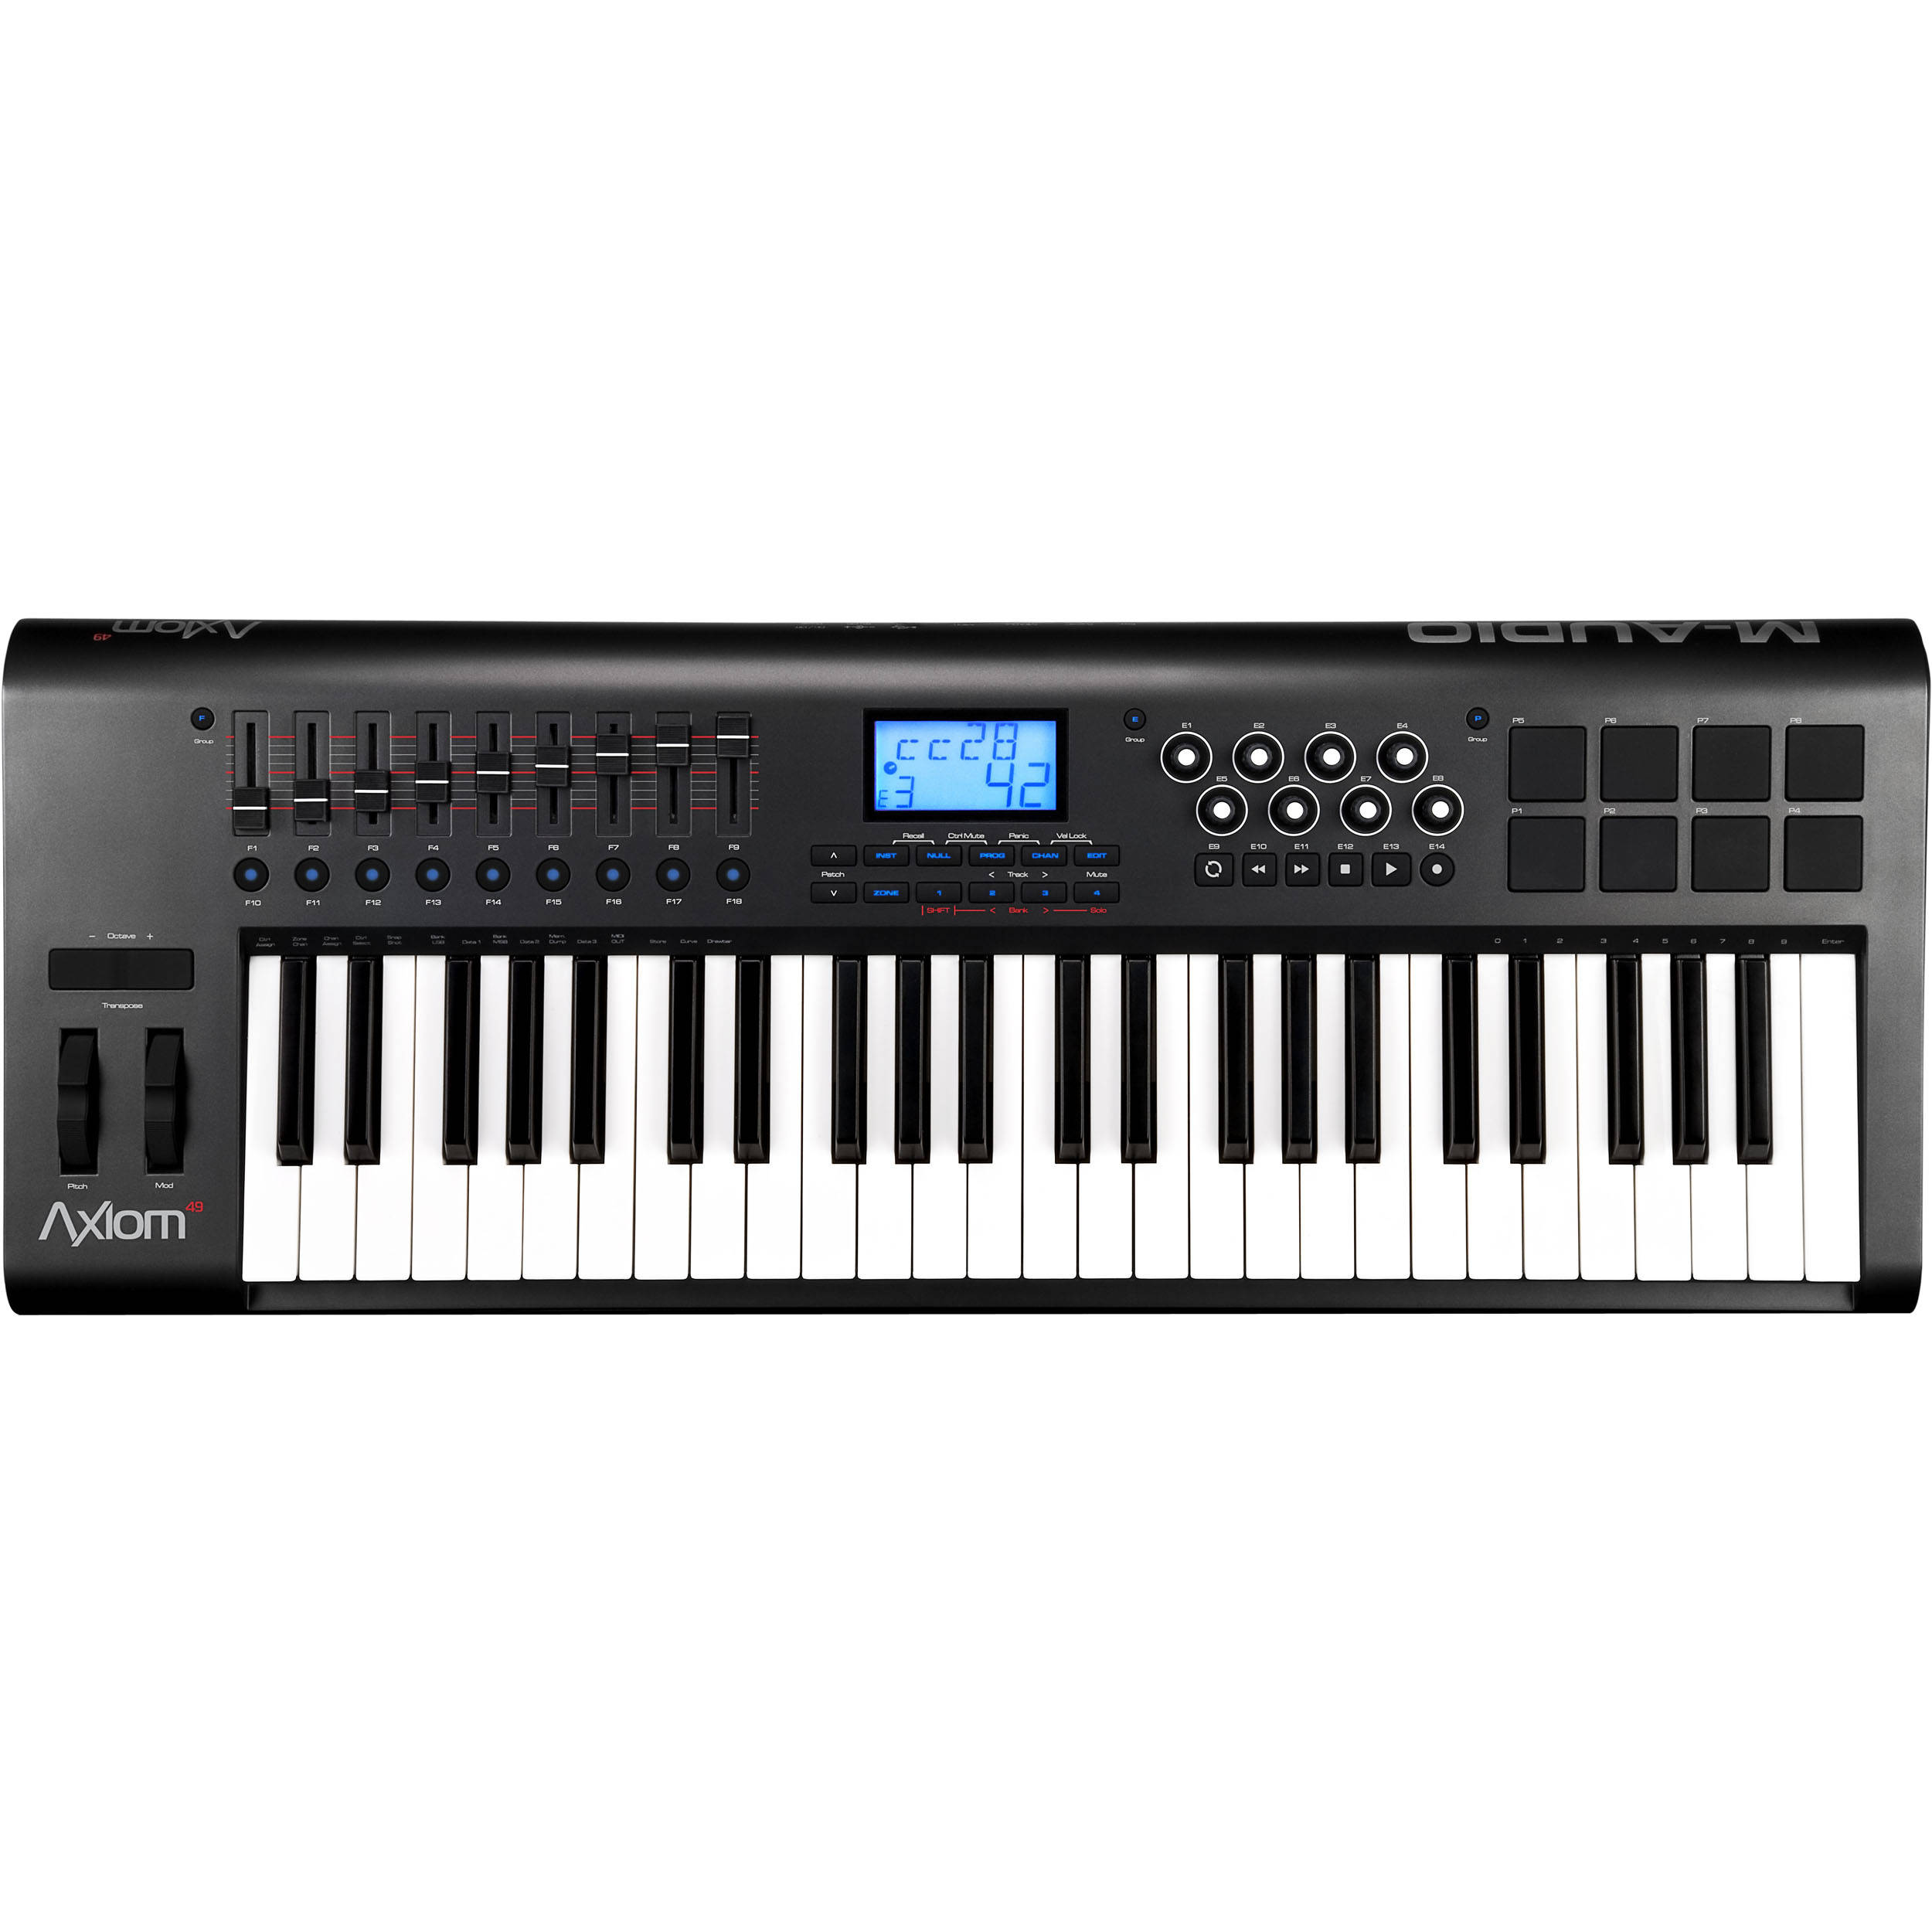 M-Audio Axiom 49 - USB MIDI Controller (Version 2)